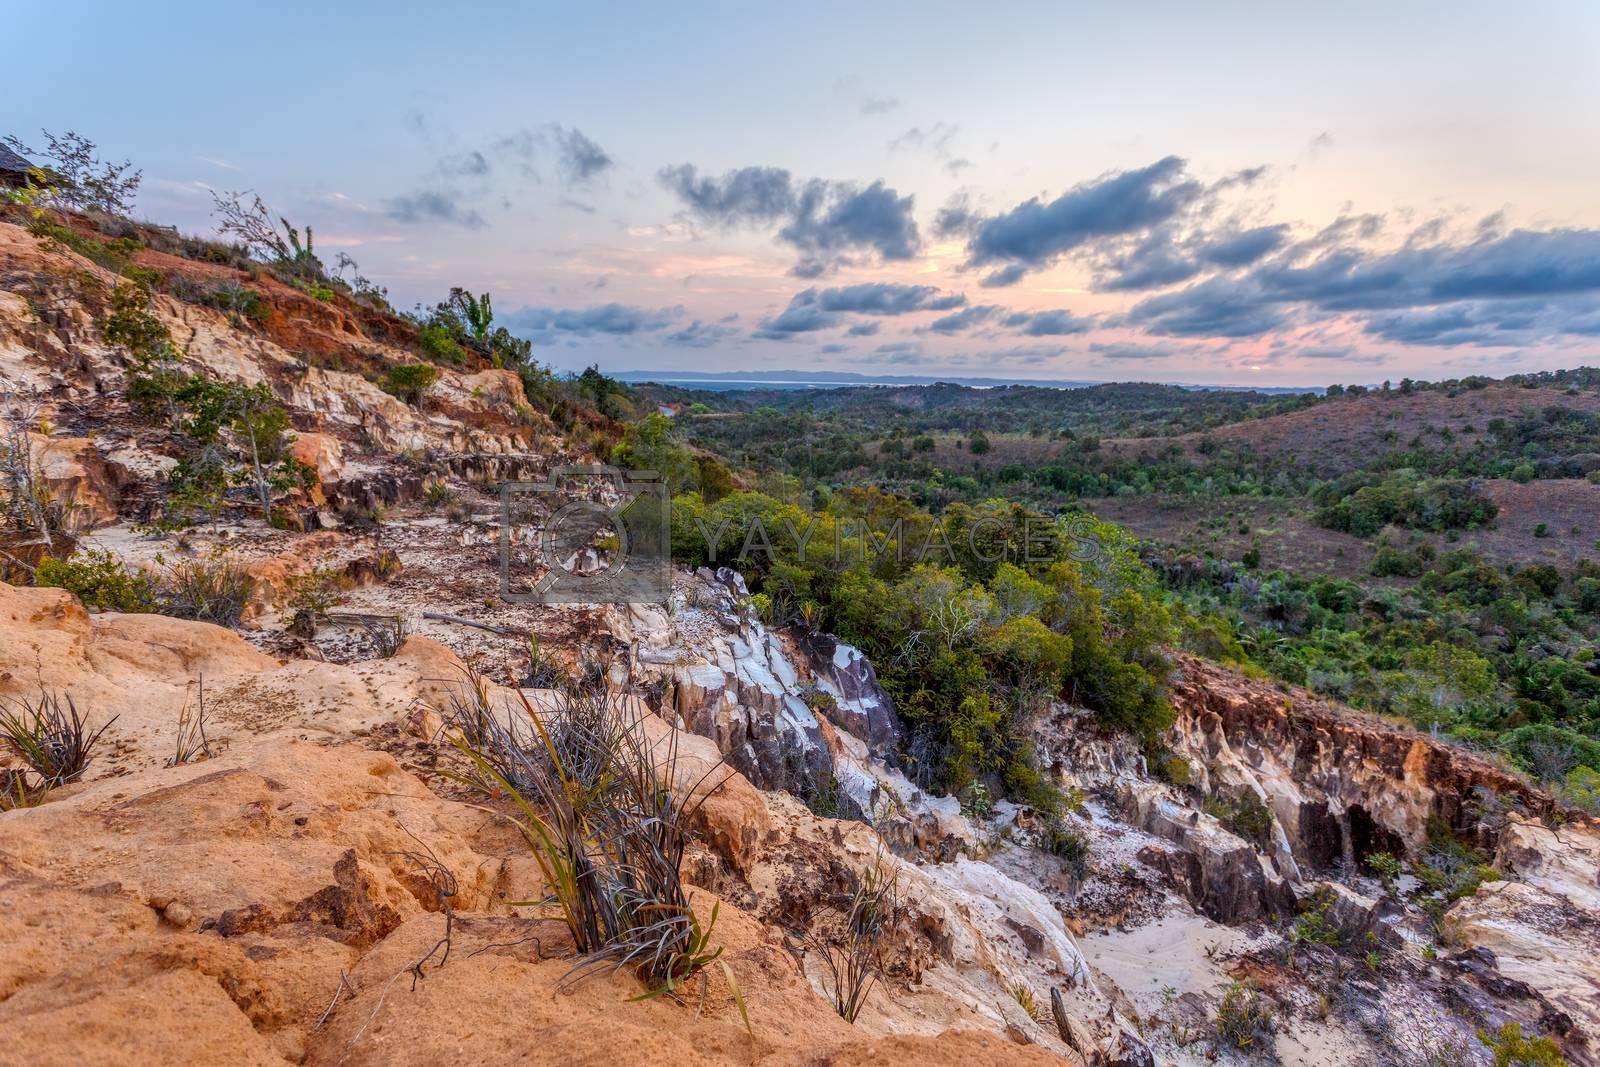 beautiful sunset in landscape near Nosy Be, Madagascar countryside